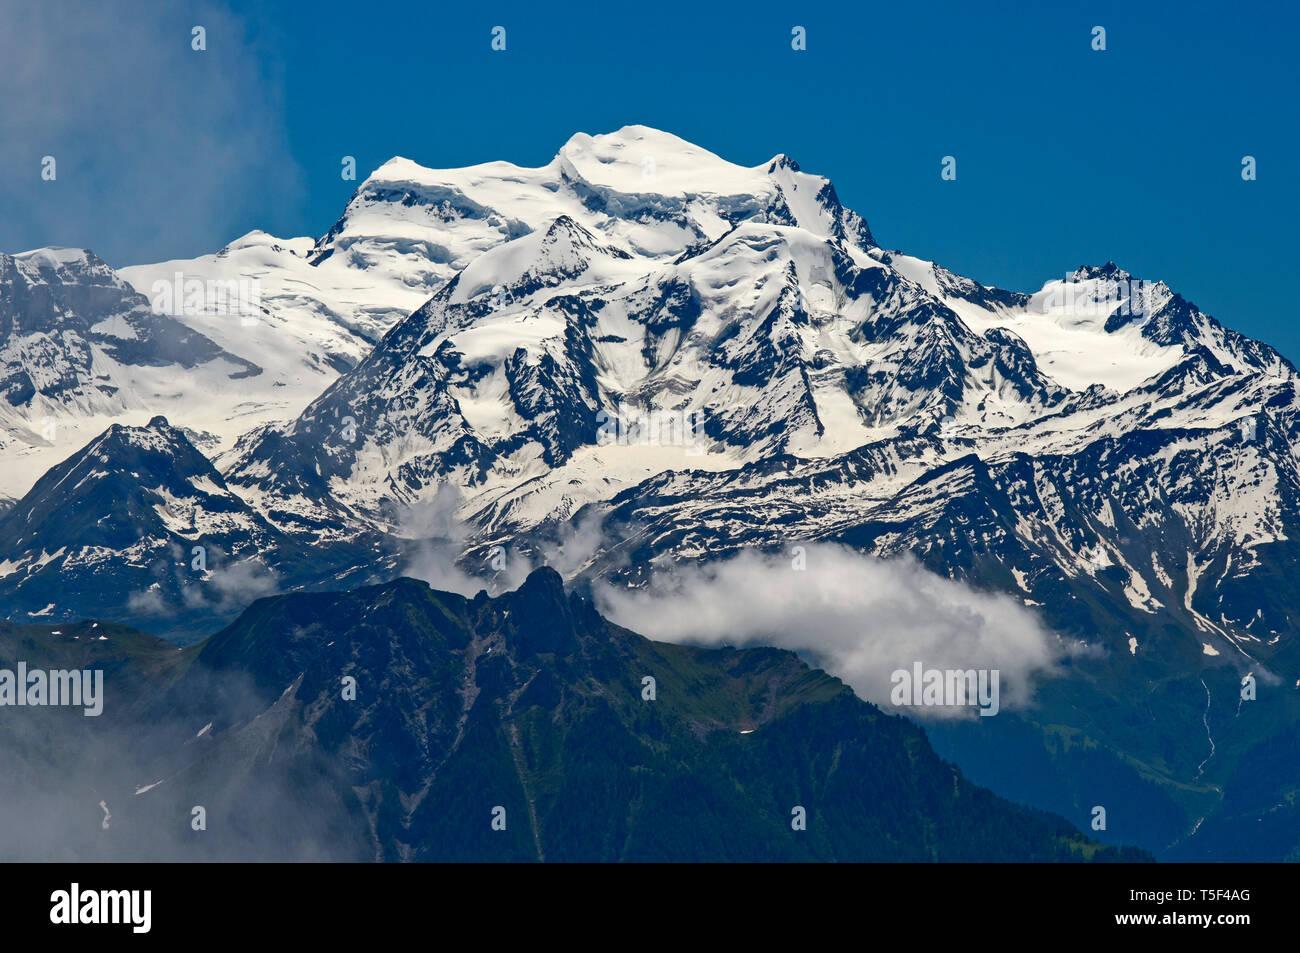 Snow-covered Grand Combin massif, Pennine Alps, Bourg-Saint-Pierre, Valais, Switzerland - Stock Image